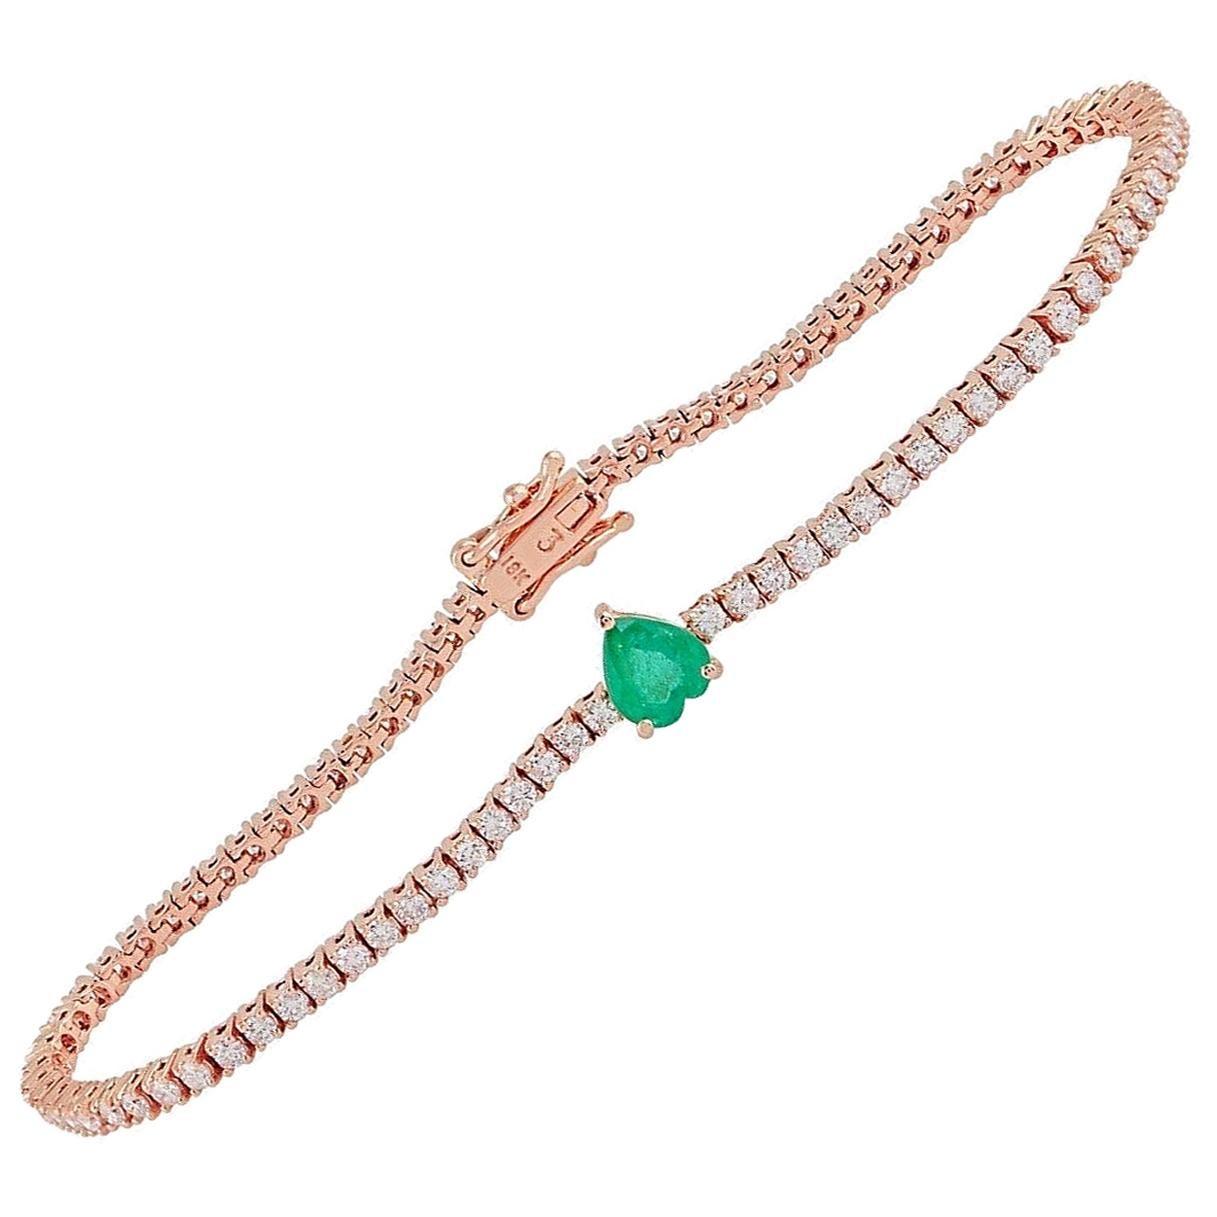 Emerald Diamond 18 Karat Gold Heart Bracelet